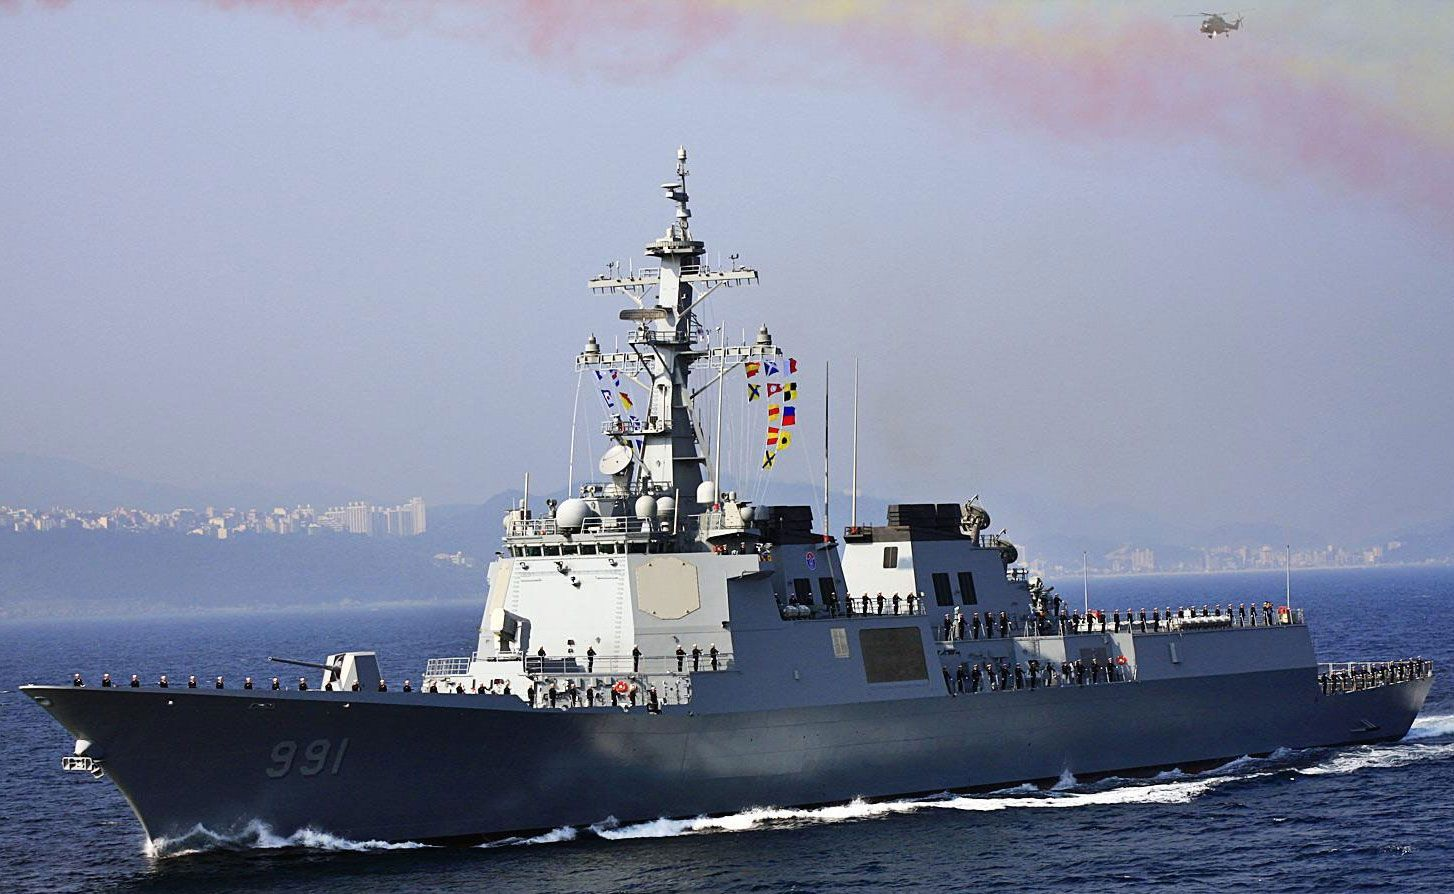 991bf_韩国第一艘宙斯盾舰ddg991世宗大王号,具备海基反导的基础